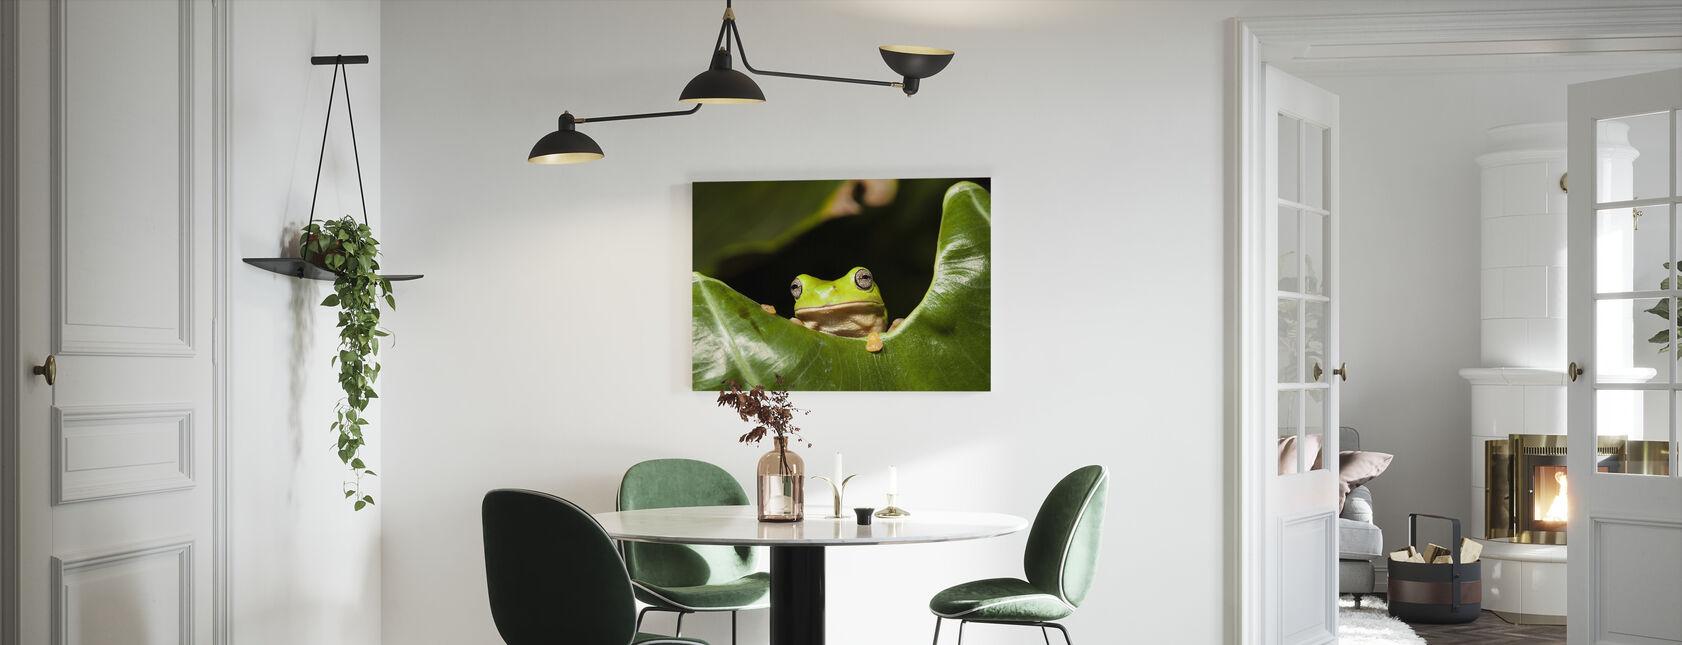 Groene Boom Kikker - Canvas print - Keuken